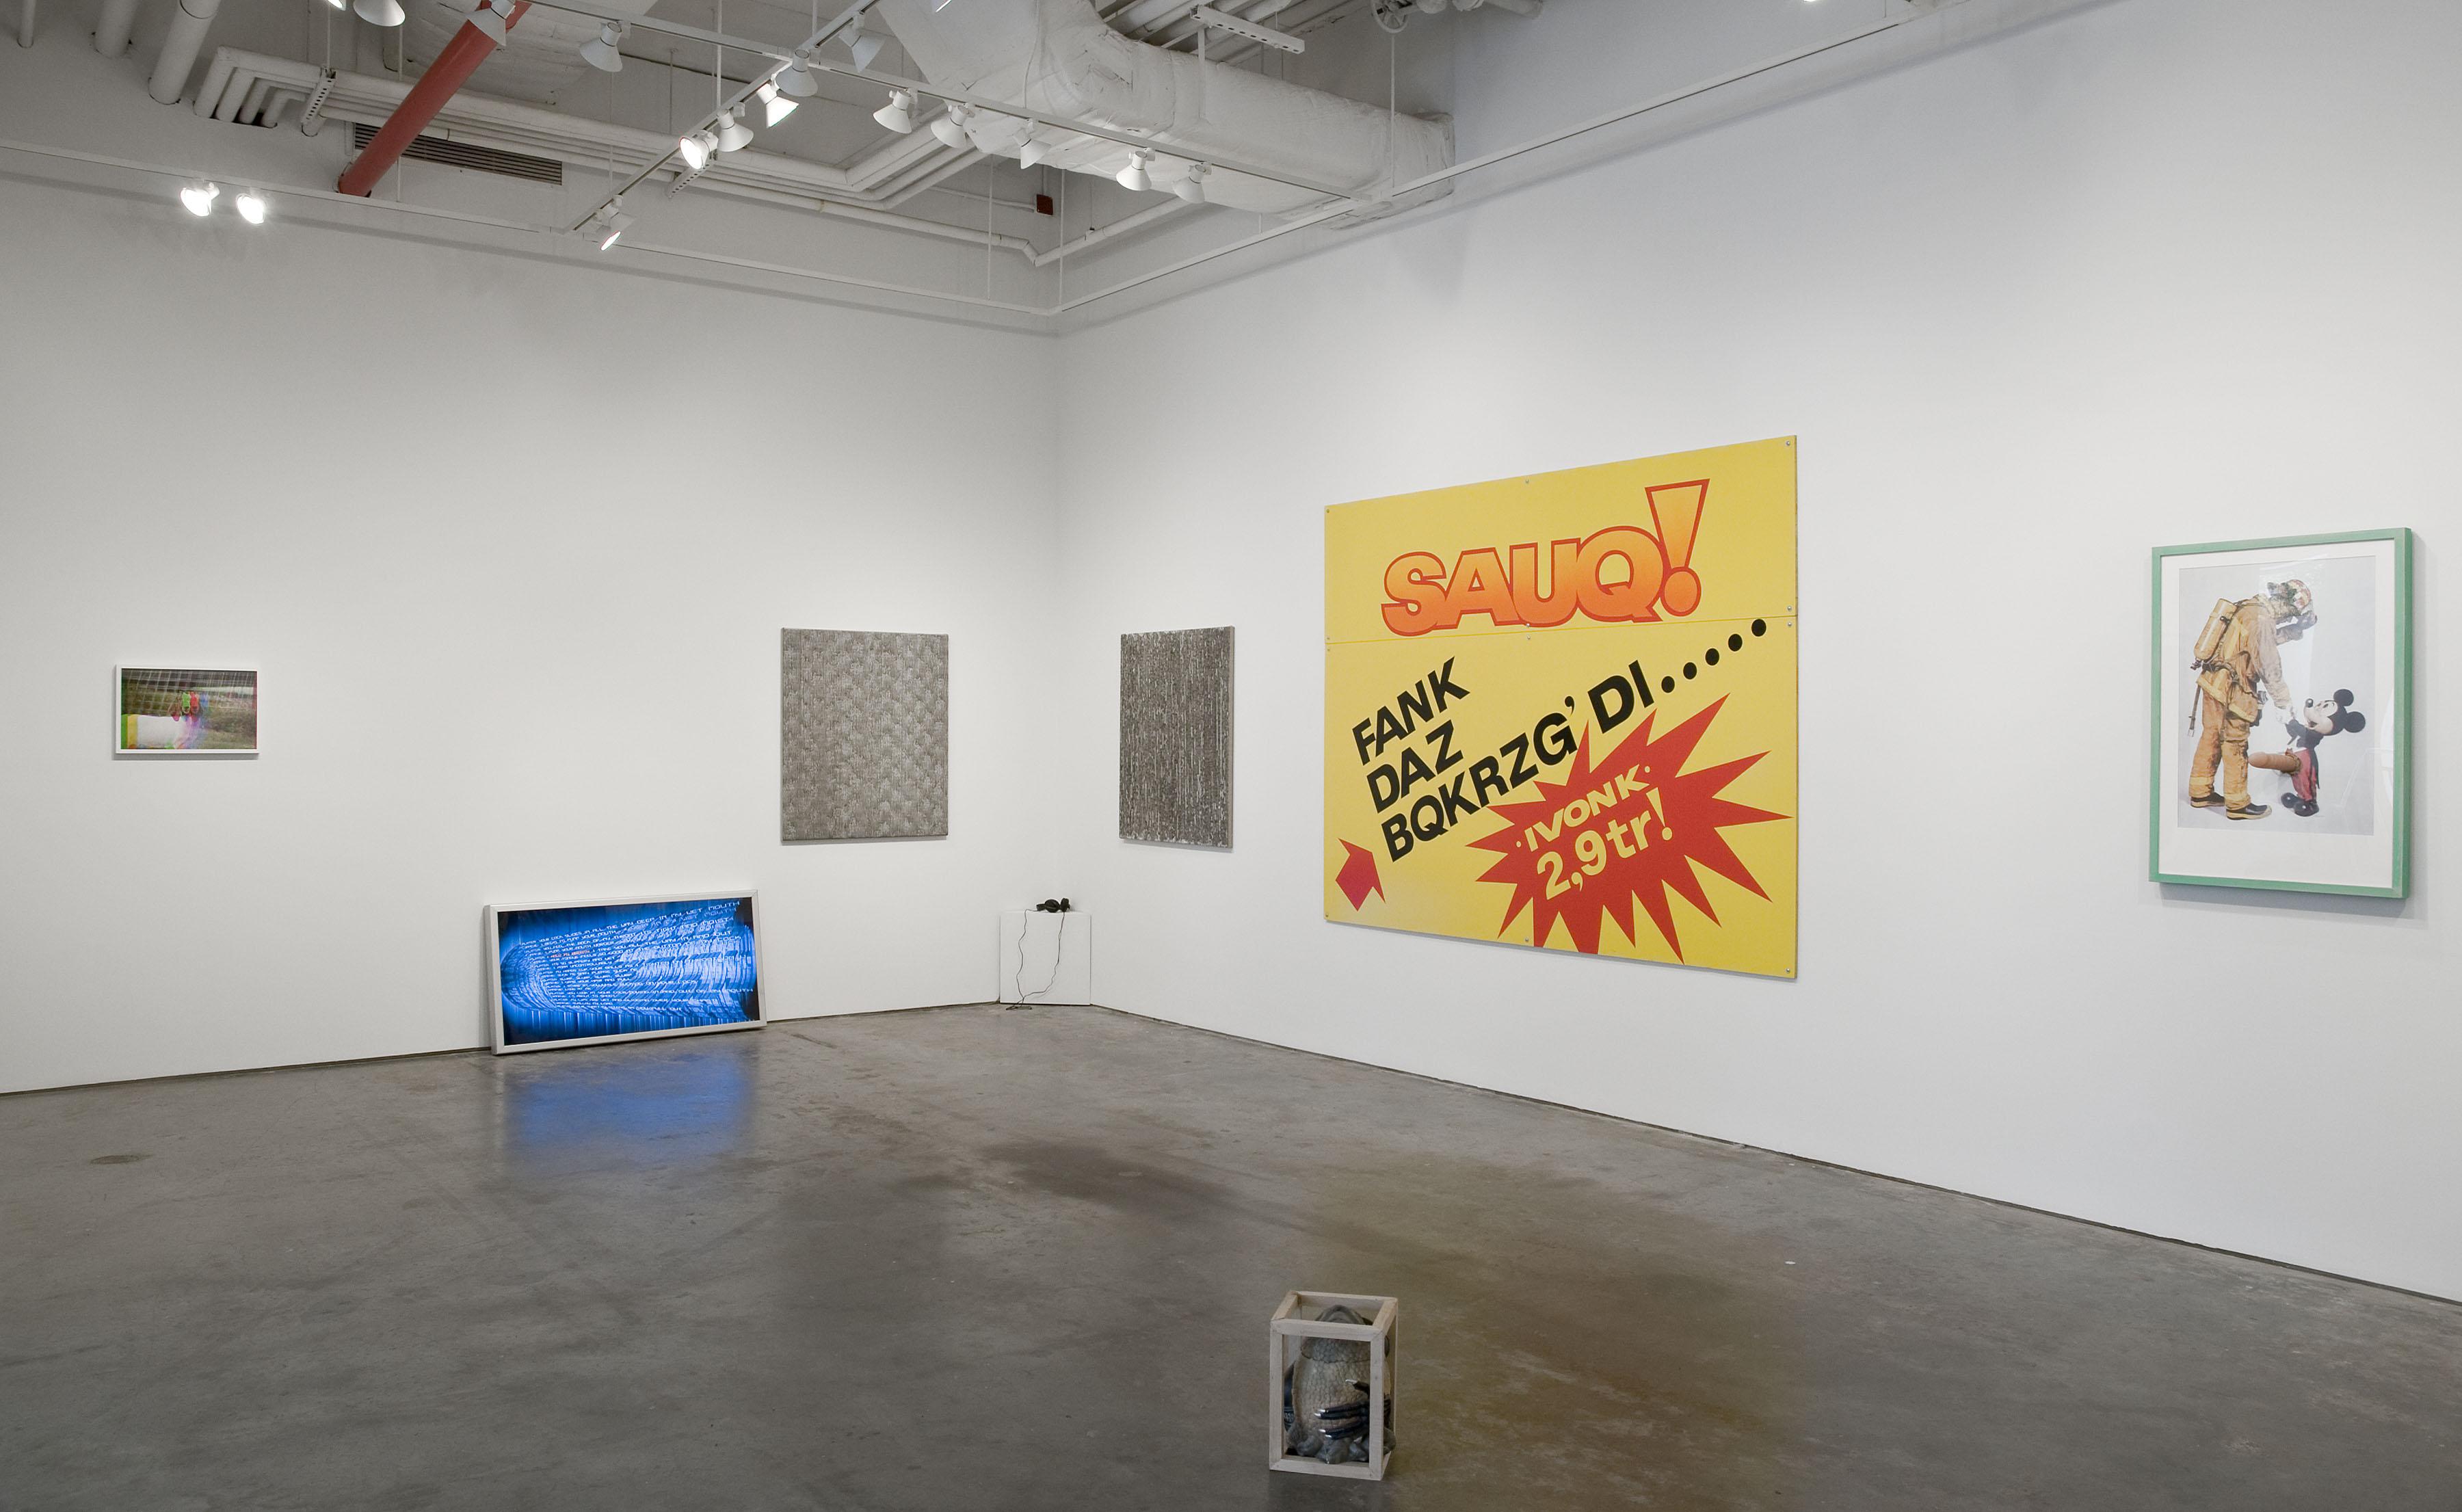 DATA TRASH | May 24 - July 20, 2012 | I-20 Gallery | Installation view